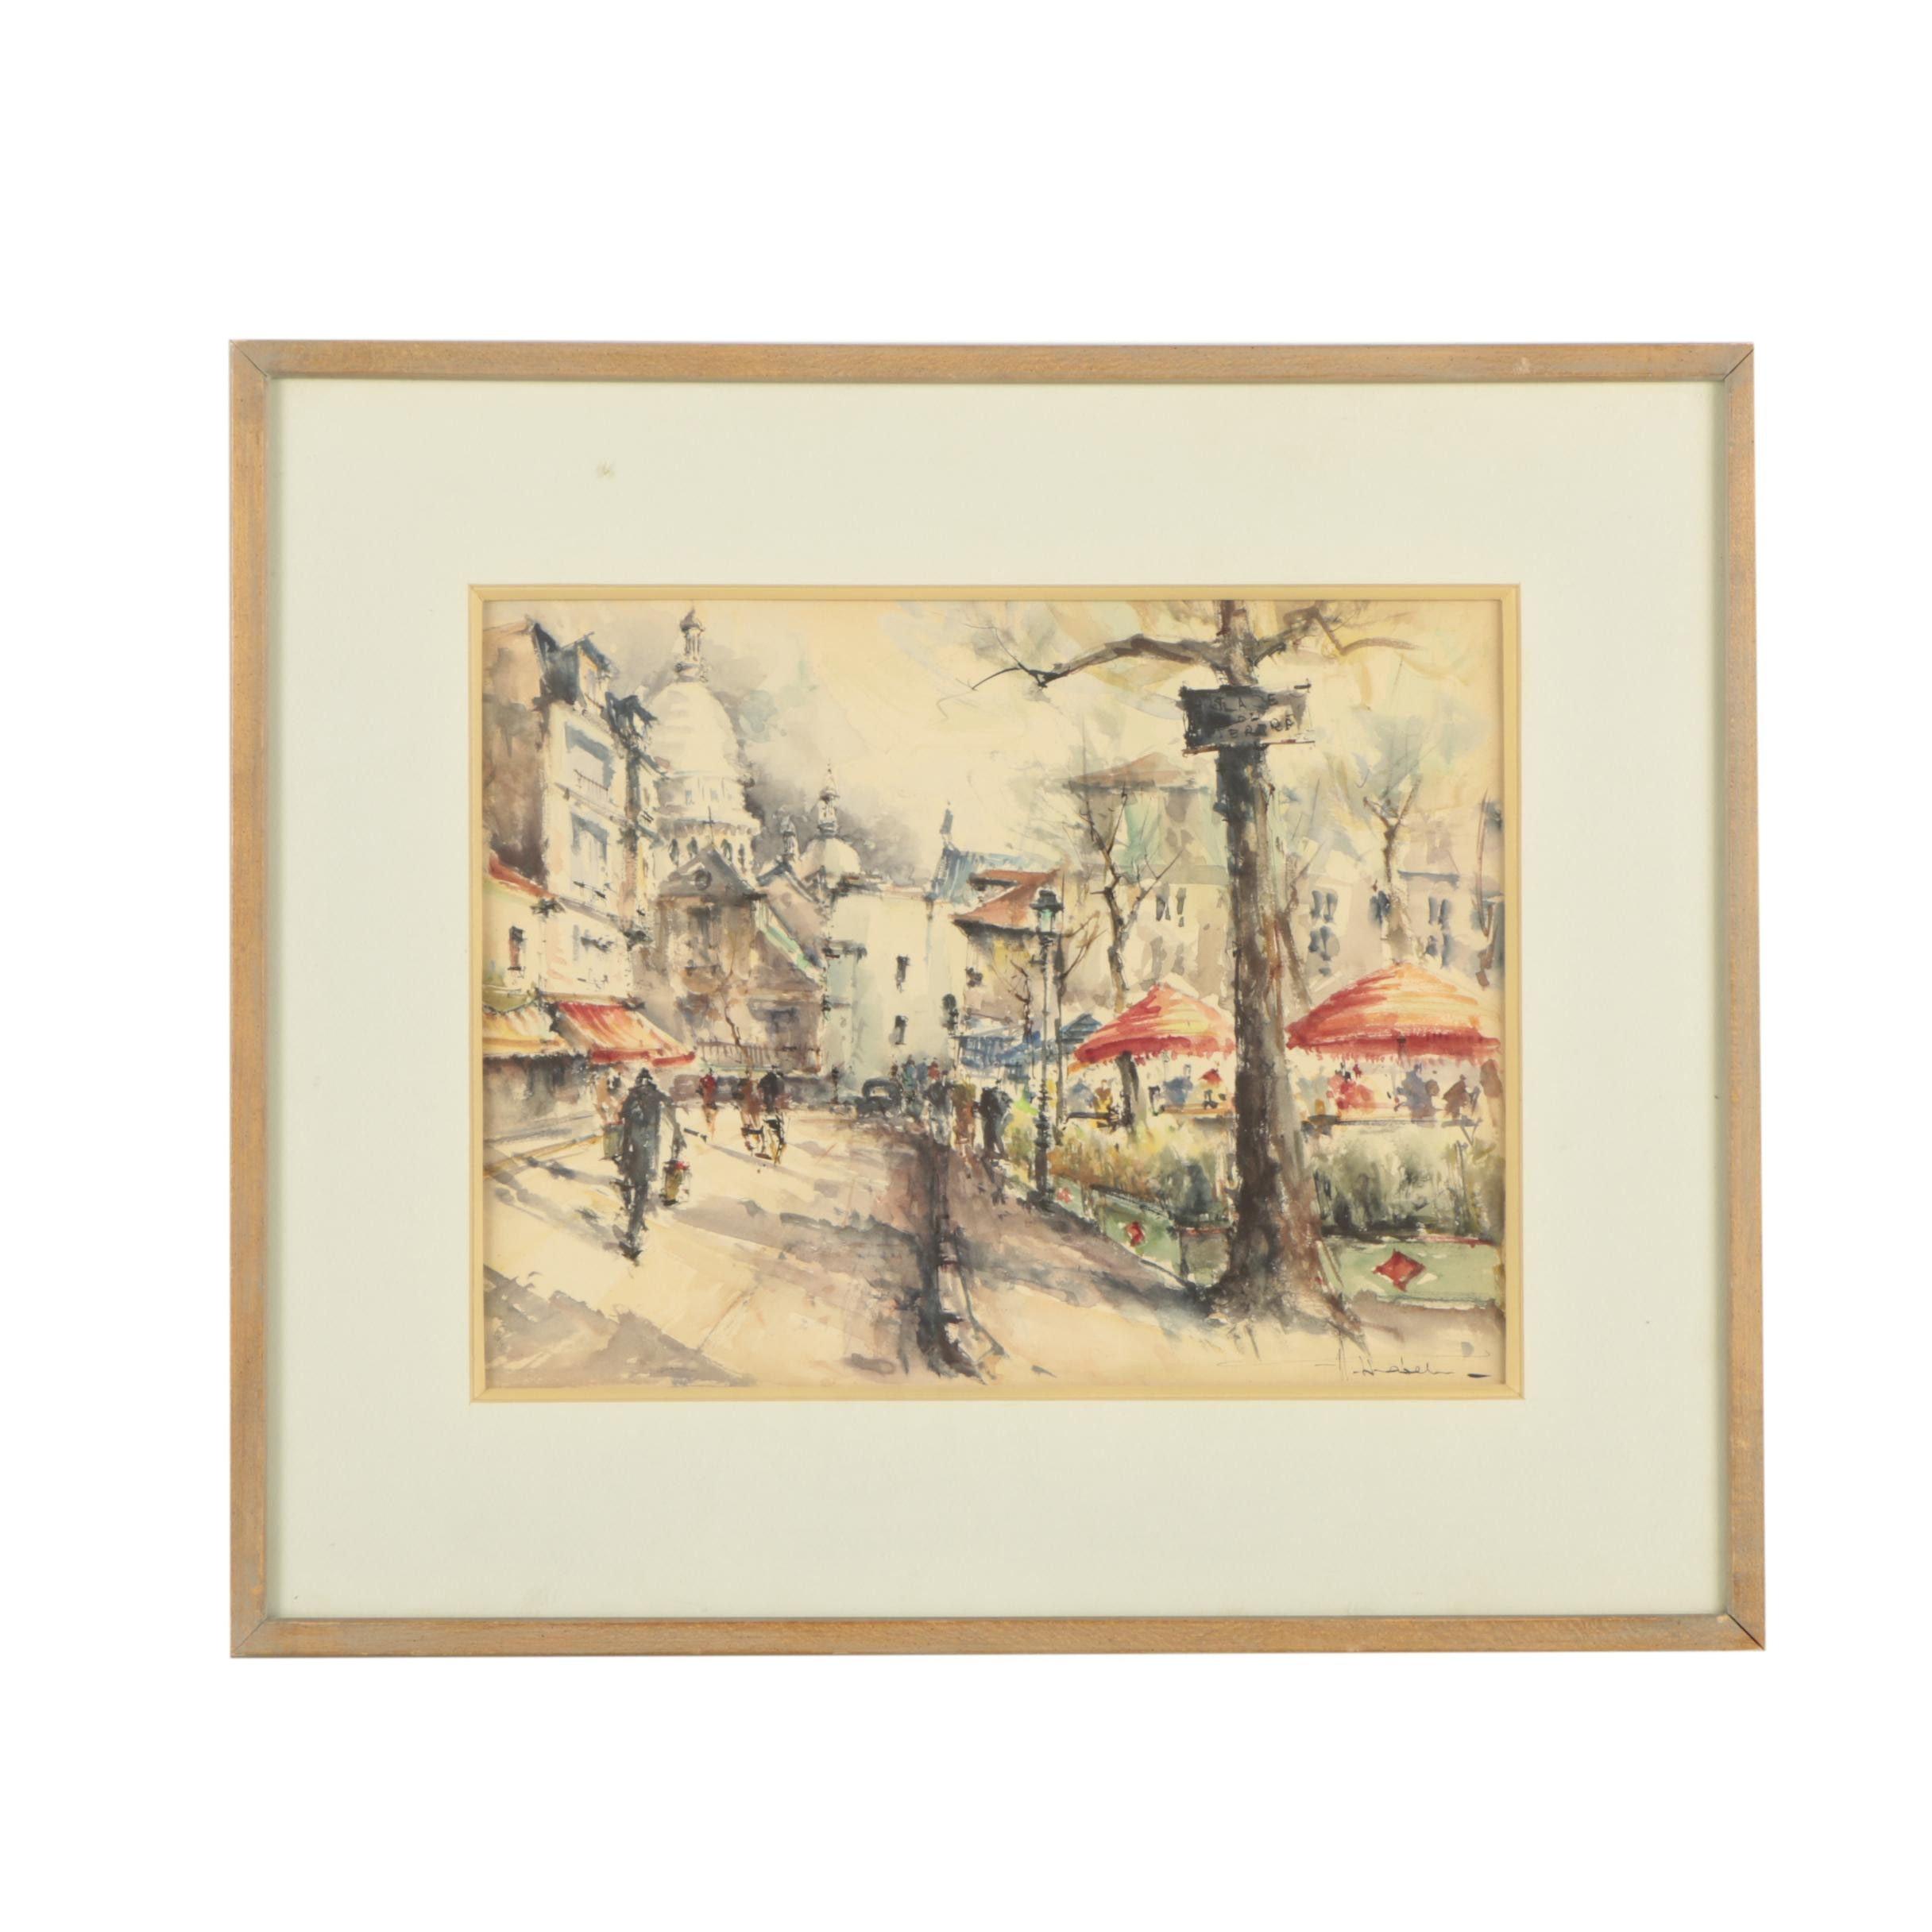 Hebel Late 20th Century Watercolor Painting of Montmartre Street Scene